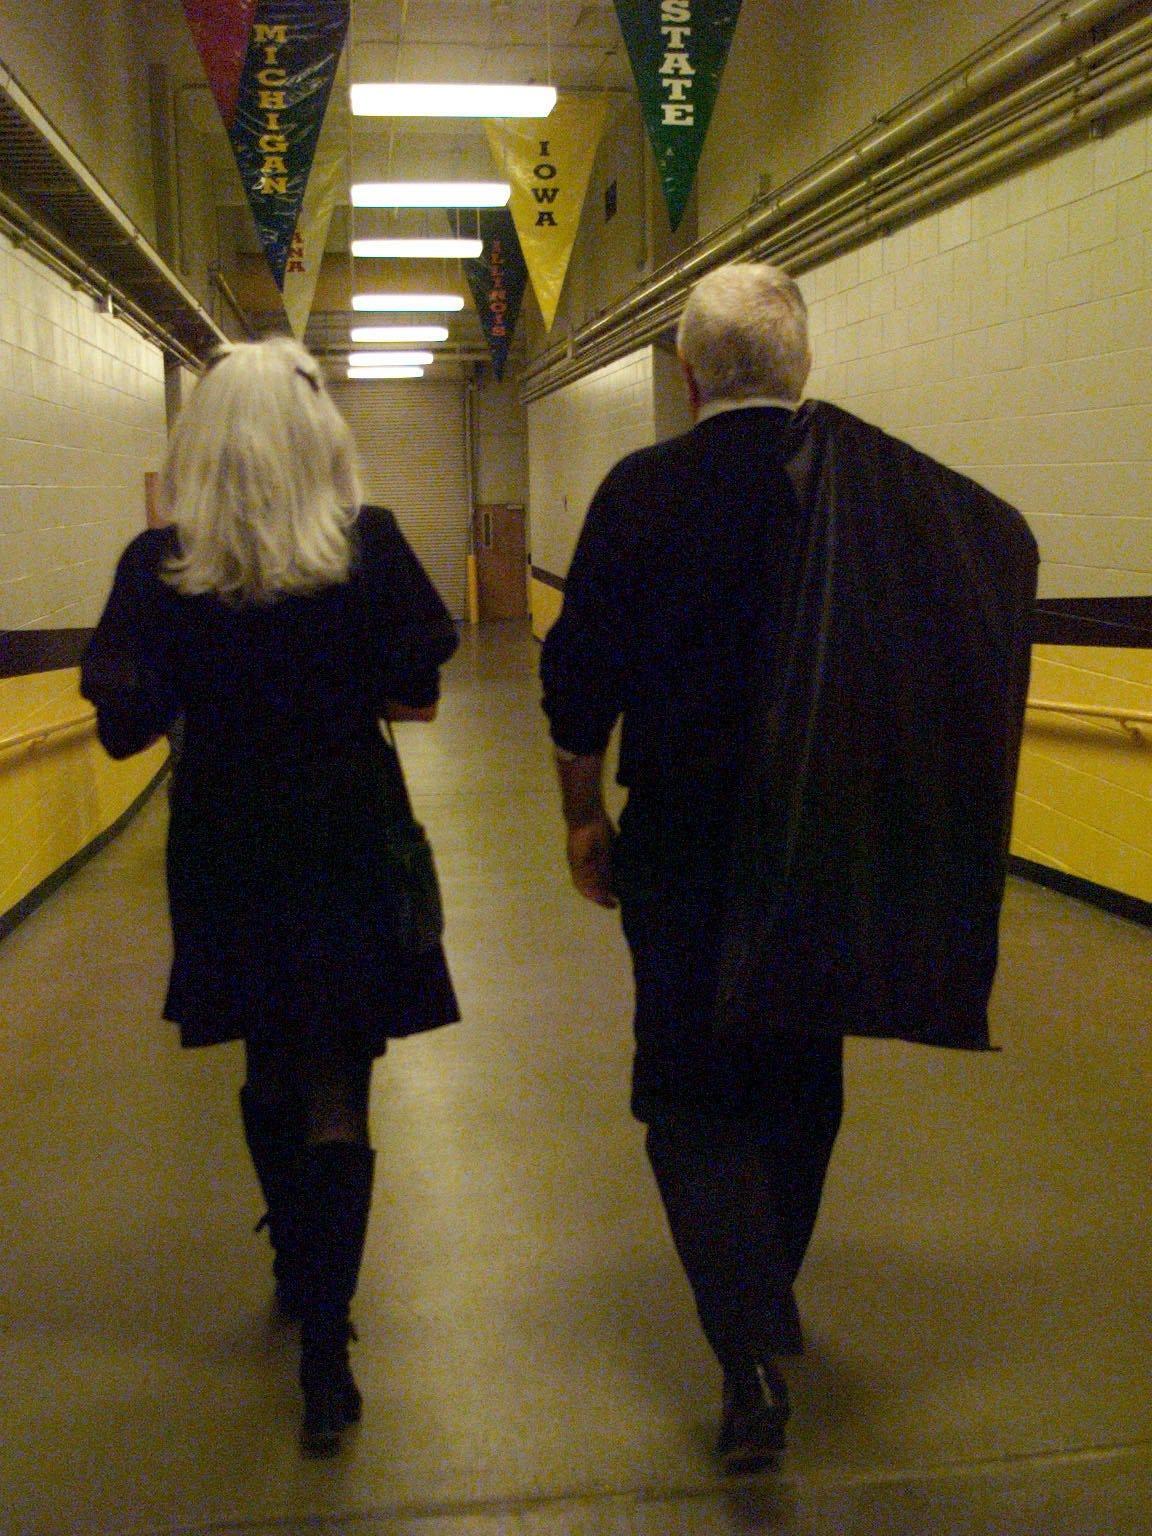 Former Iowa Coach Tom Davis and his wife, Shari, walk